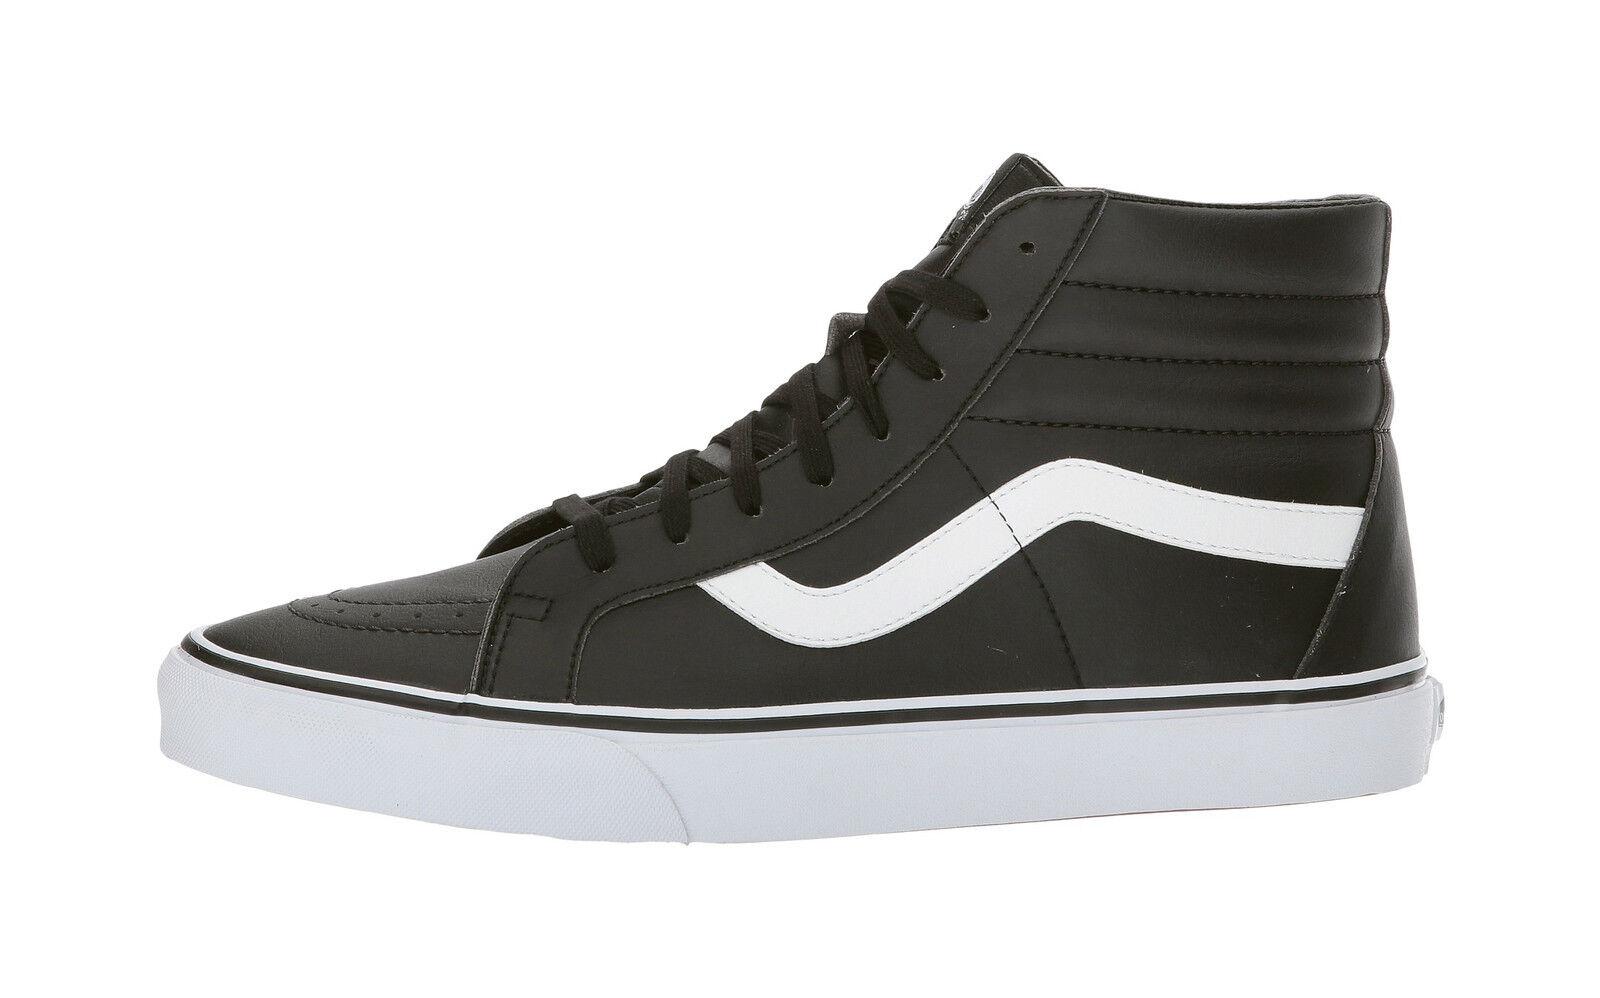 36b7606015 VANS Sk8 Hi Reissue Classic Tumble Black True White Skate Sports ...